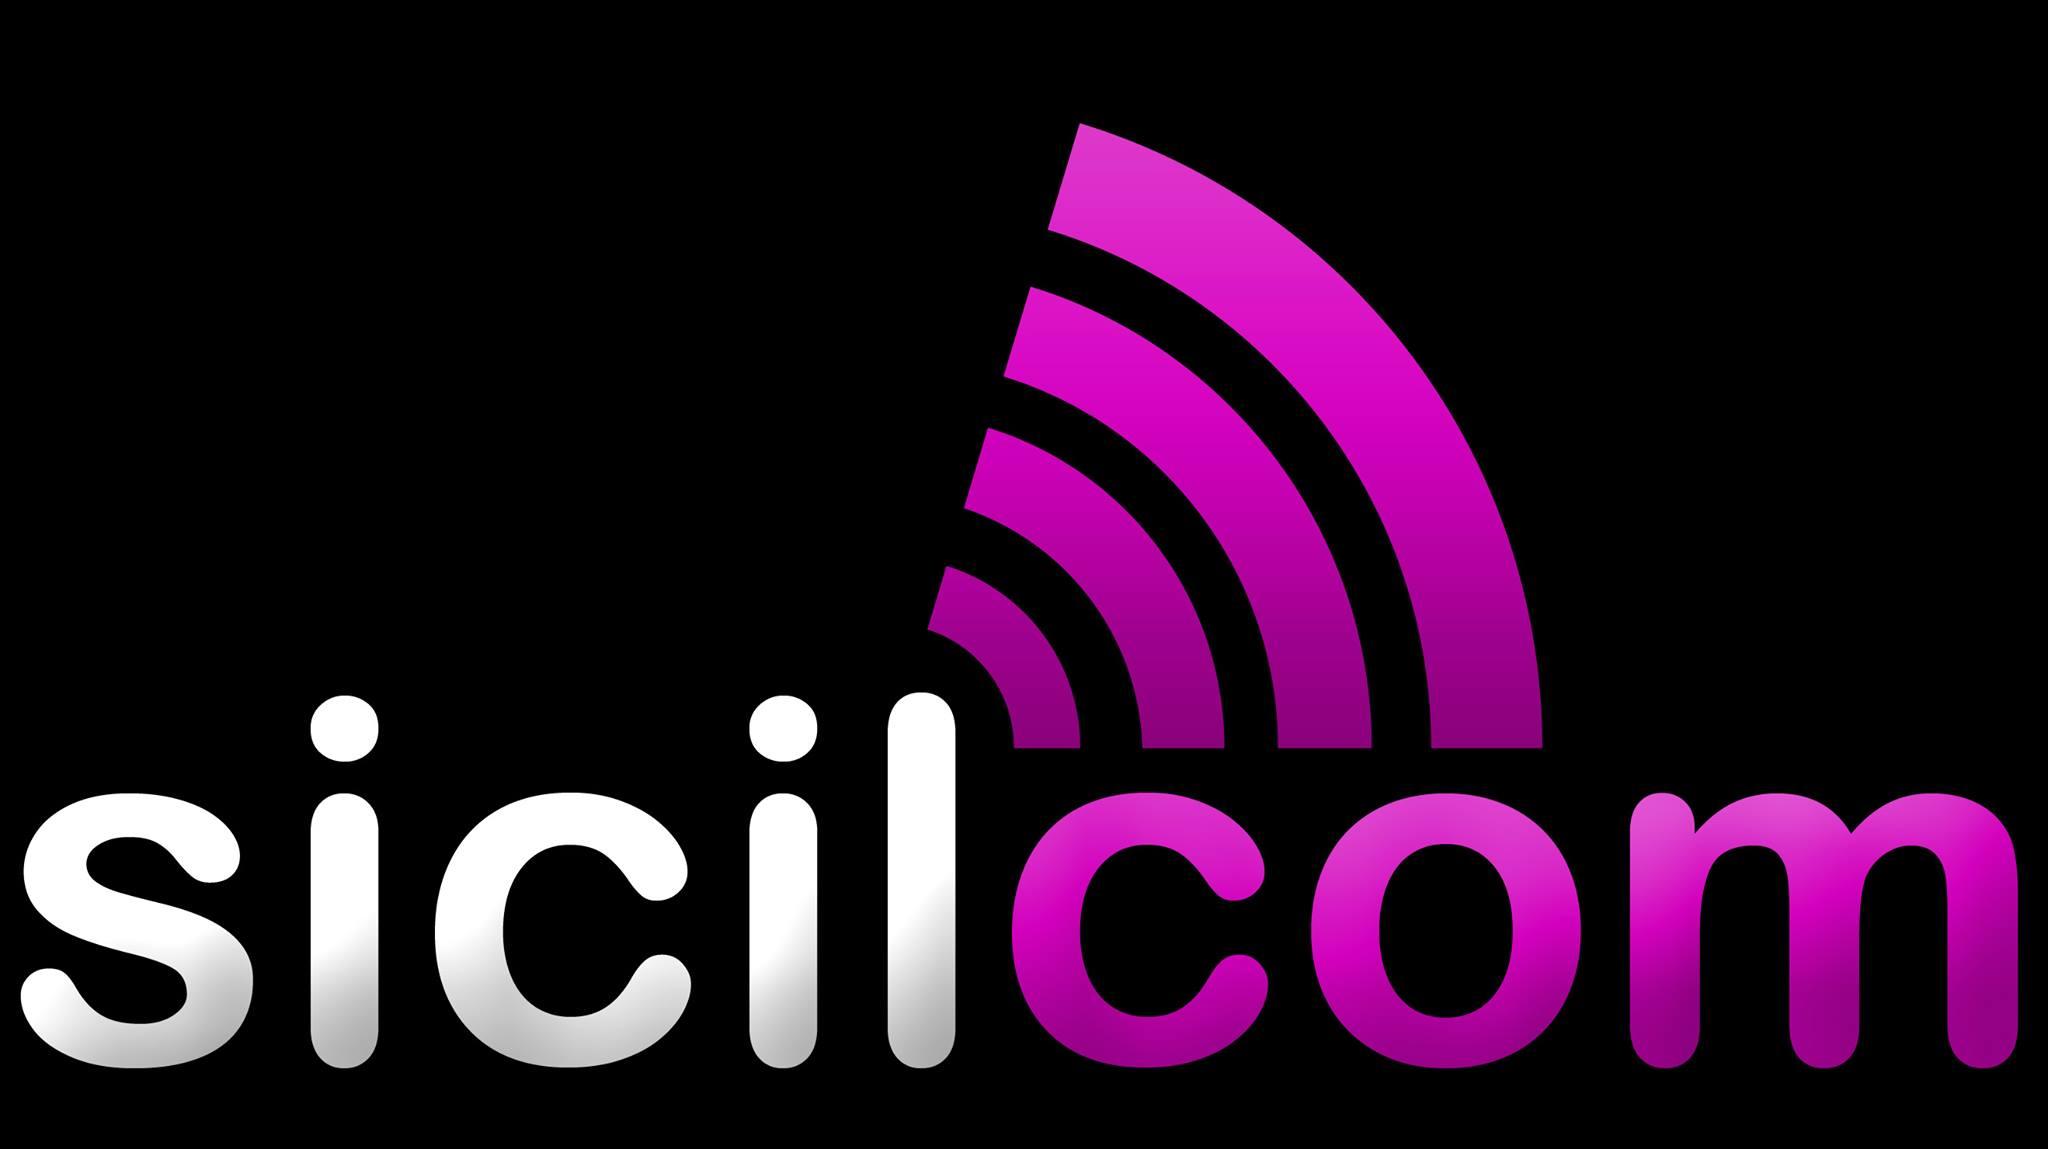 Sicilcom - Telecomunicazioni